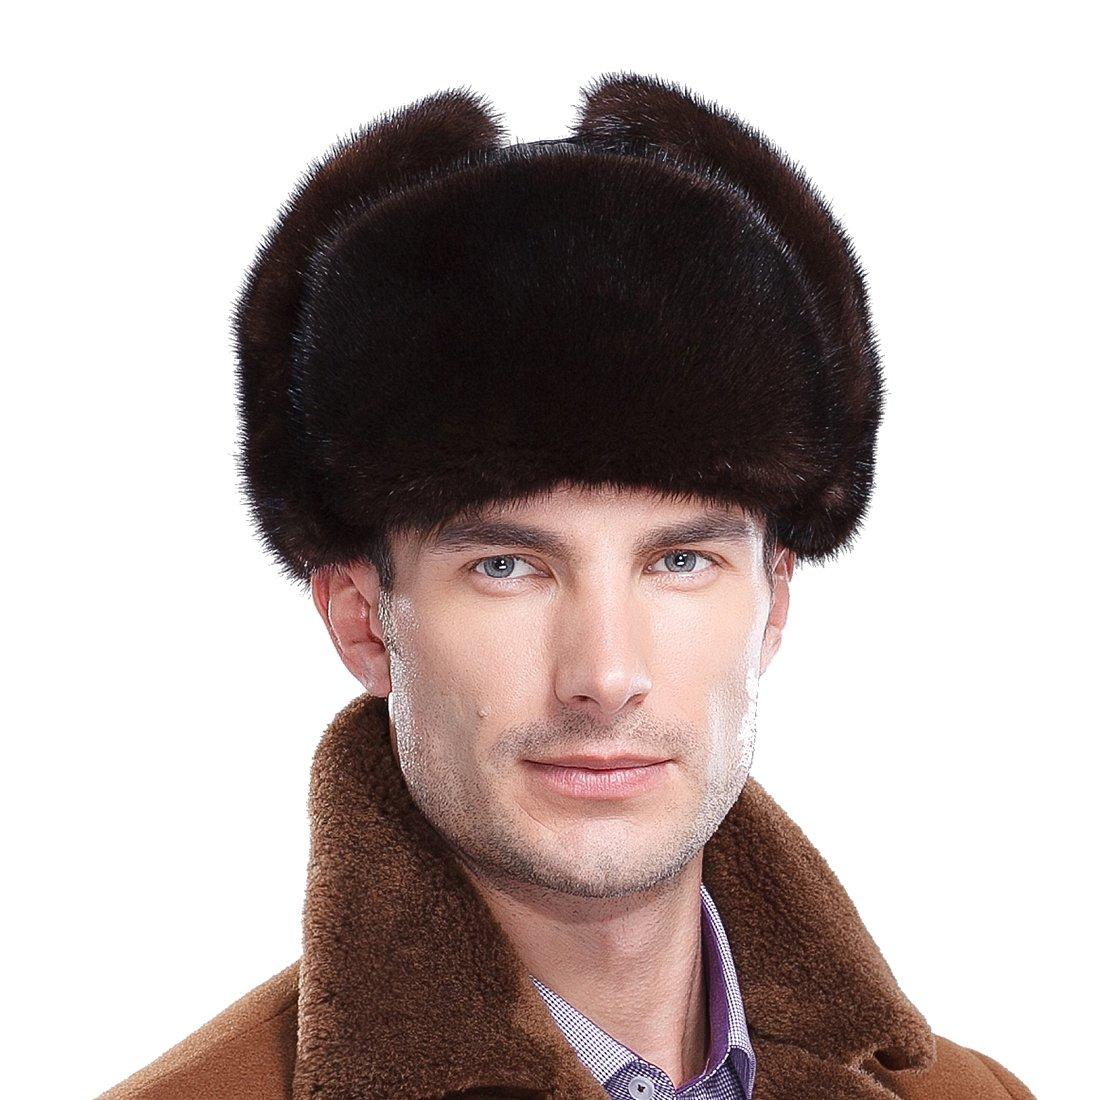 URSFUR Classic Men's Mink Fur & Leather Russian Ushanka Hats (One Size, Natural Color)